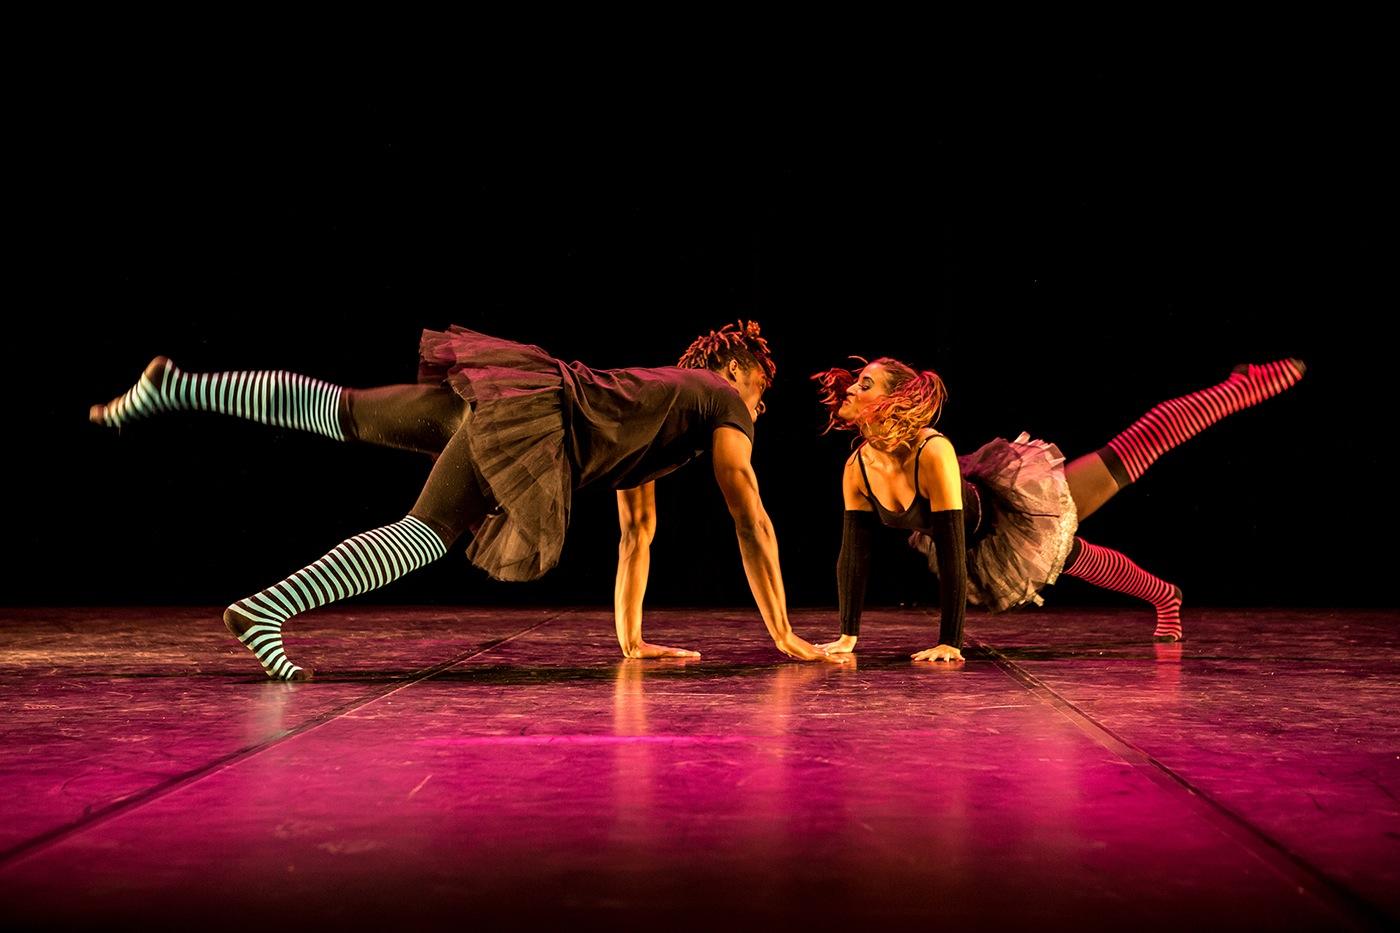 photographe-reportage-danse-avec-ton-crous-guillaume-heraud-034-small